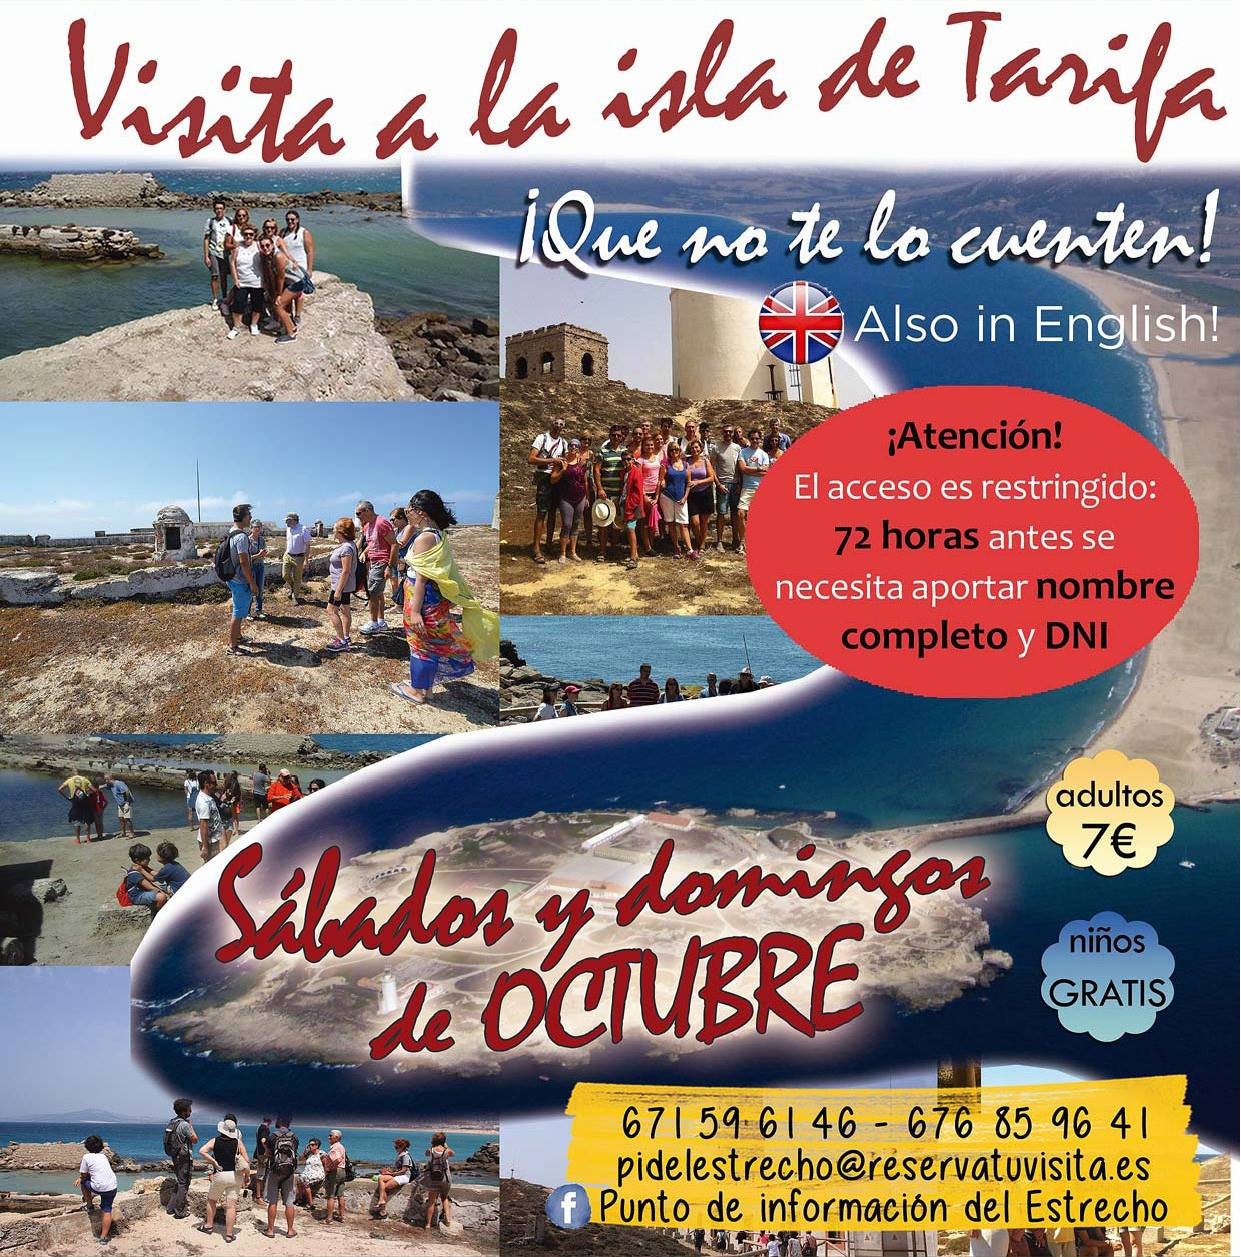 Visita a la Isla de Tarifa Octubre 2017